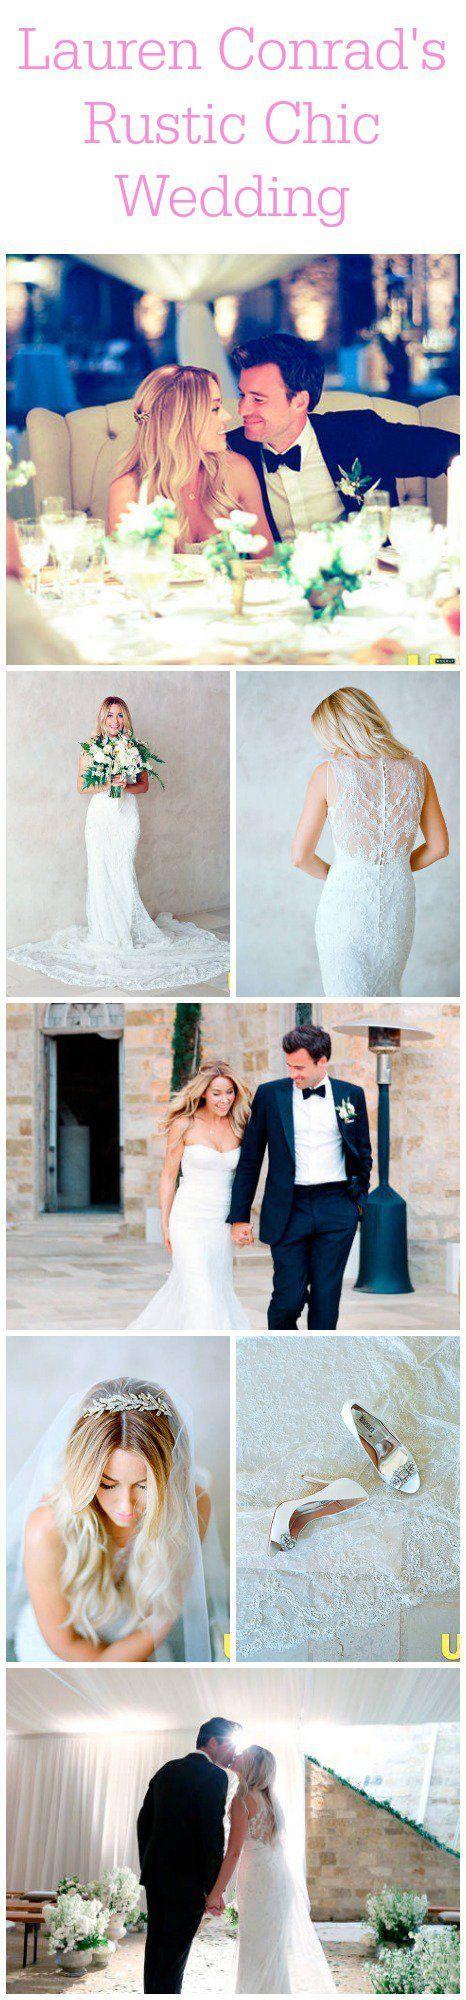 19 best Celebrity weddings images on Pinterest | Celebrity weddings ...